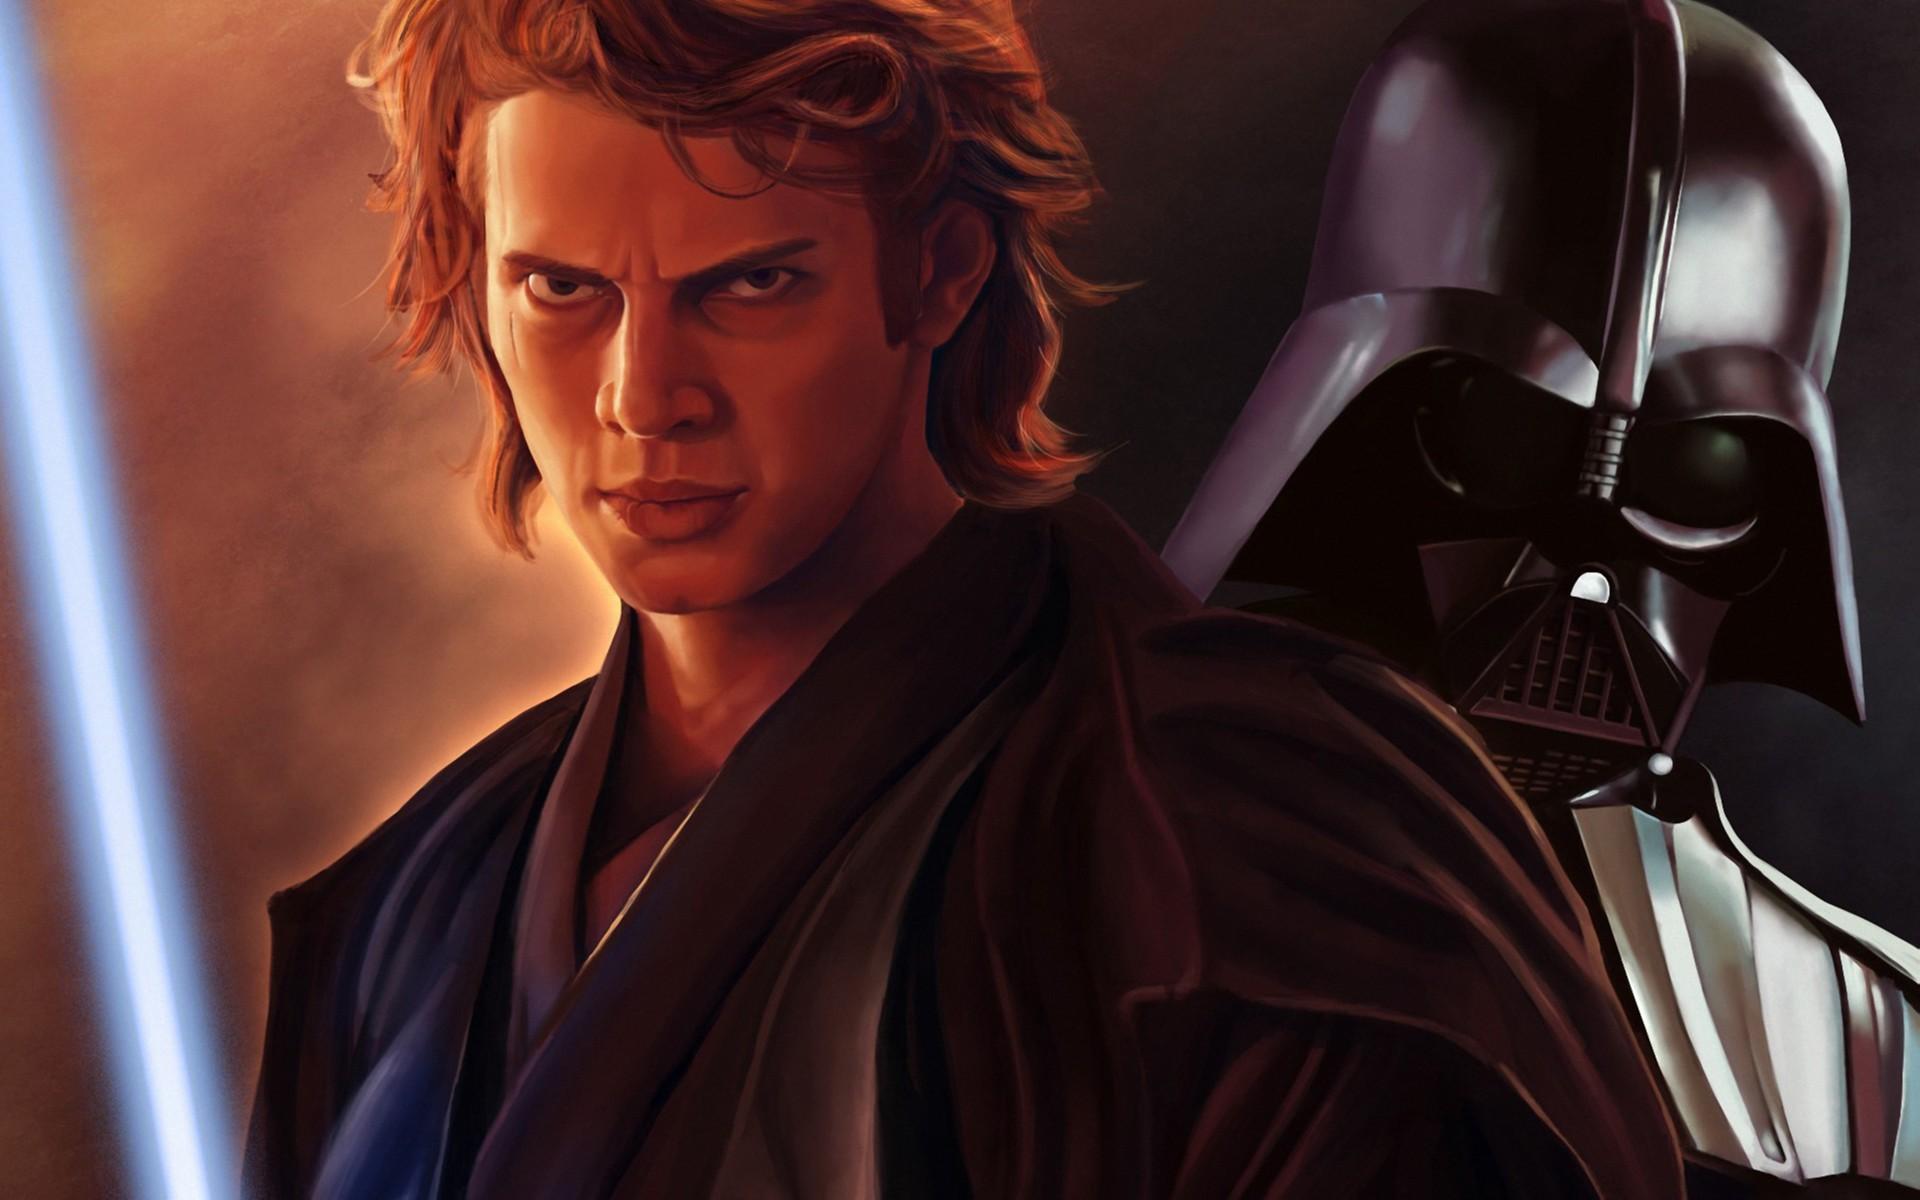 Anakin Skywalker Dart Vader lightsaber sci fi wallpaper background 1920x1200